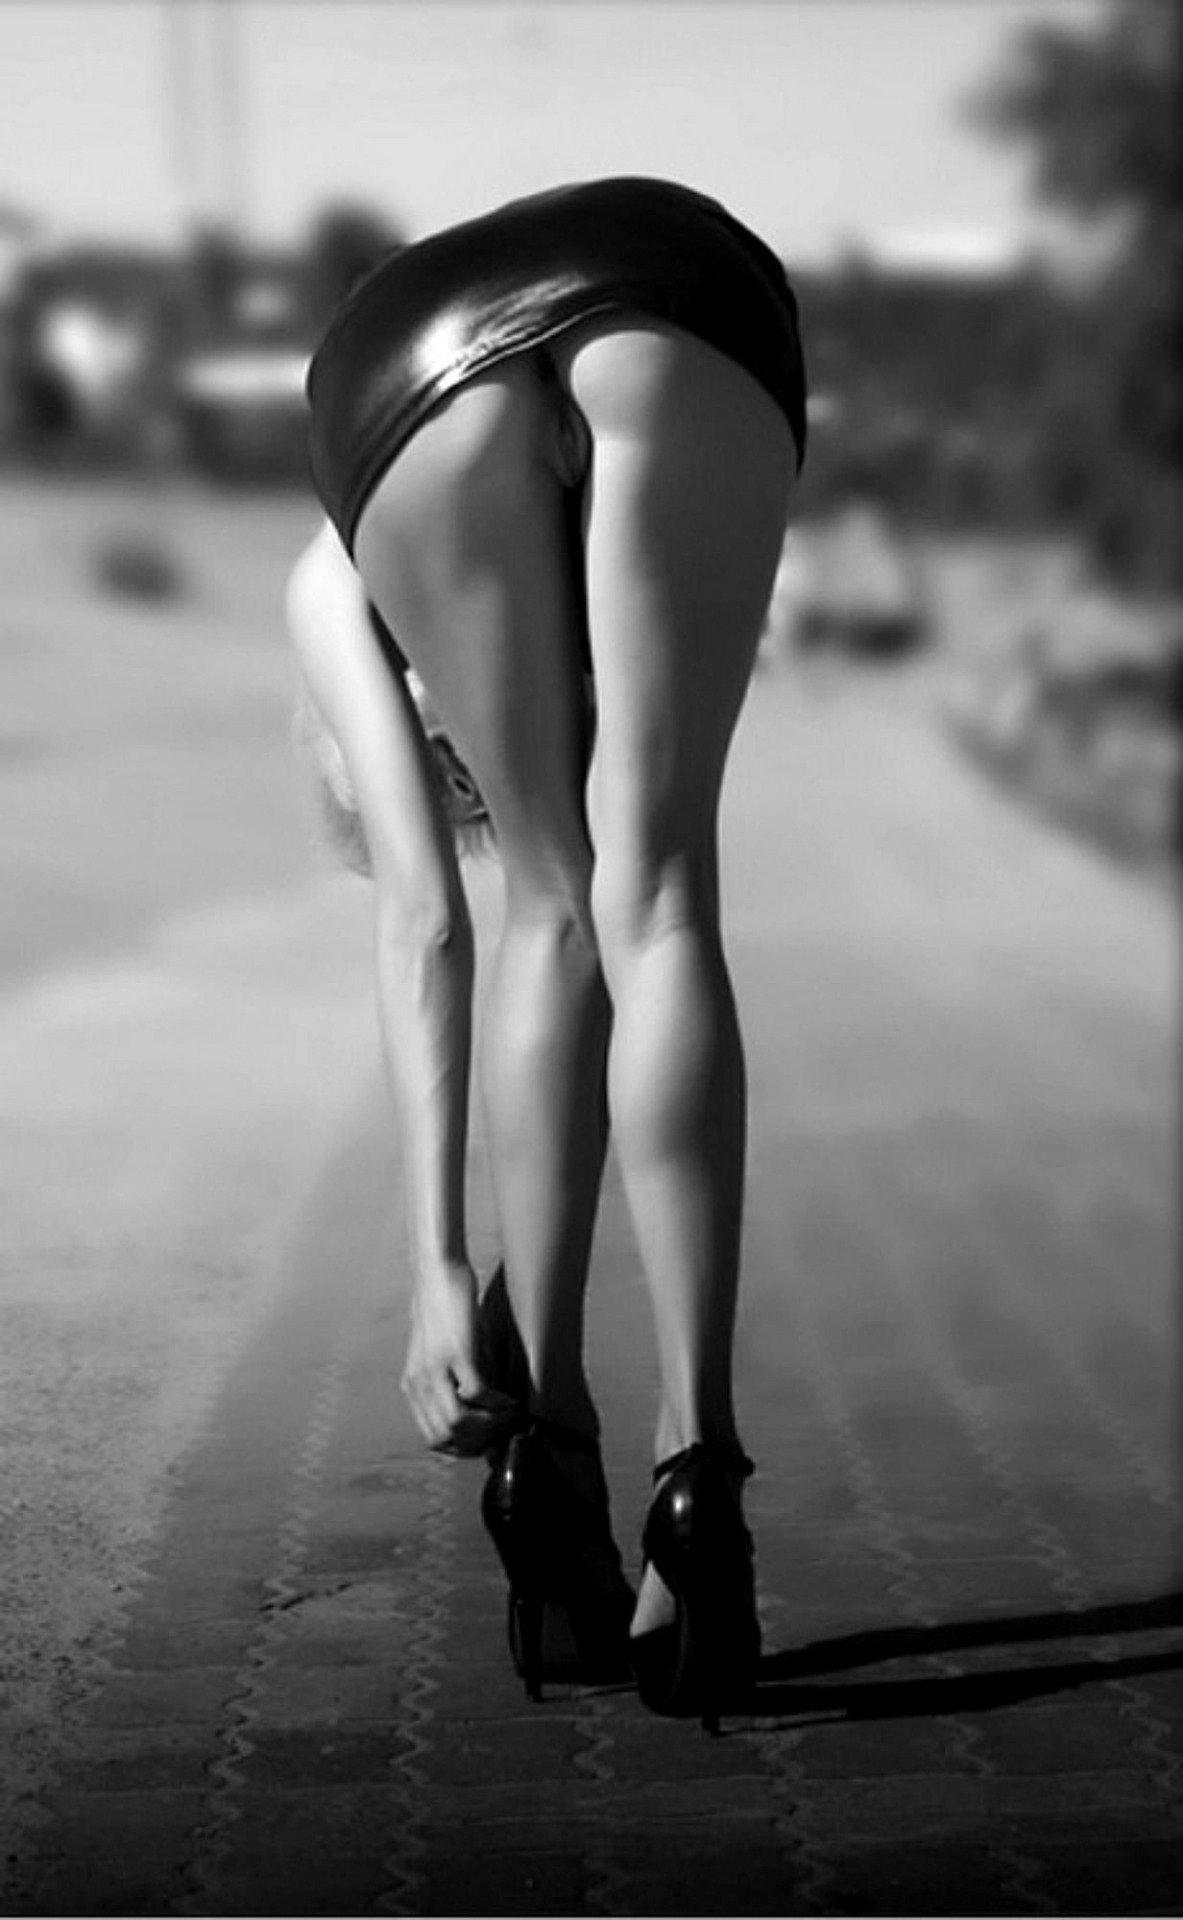 Фото секси ног 20 фотография